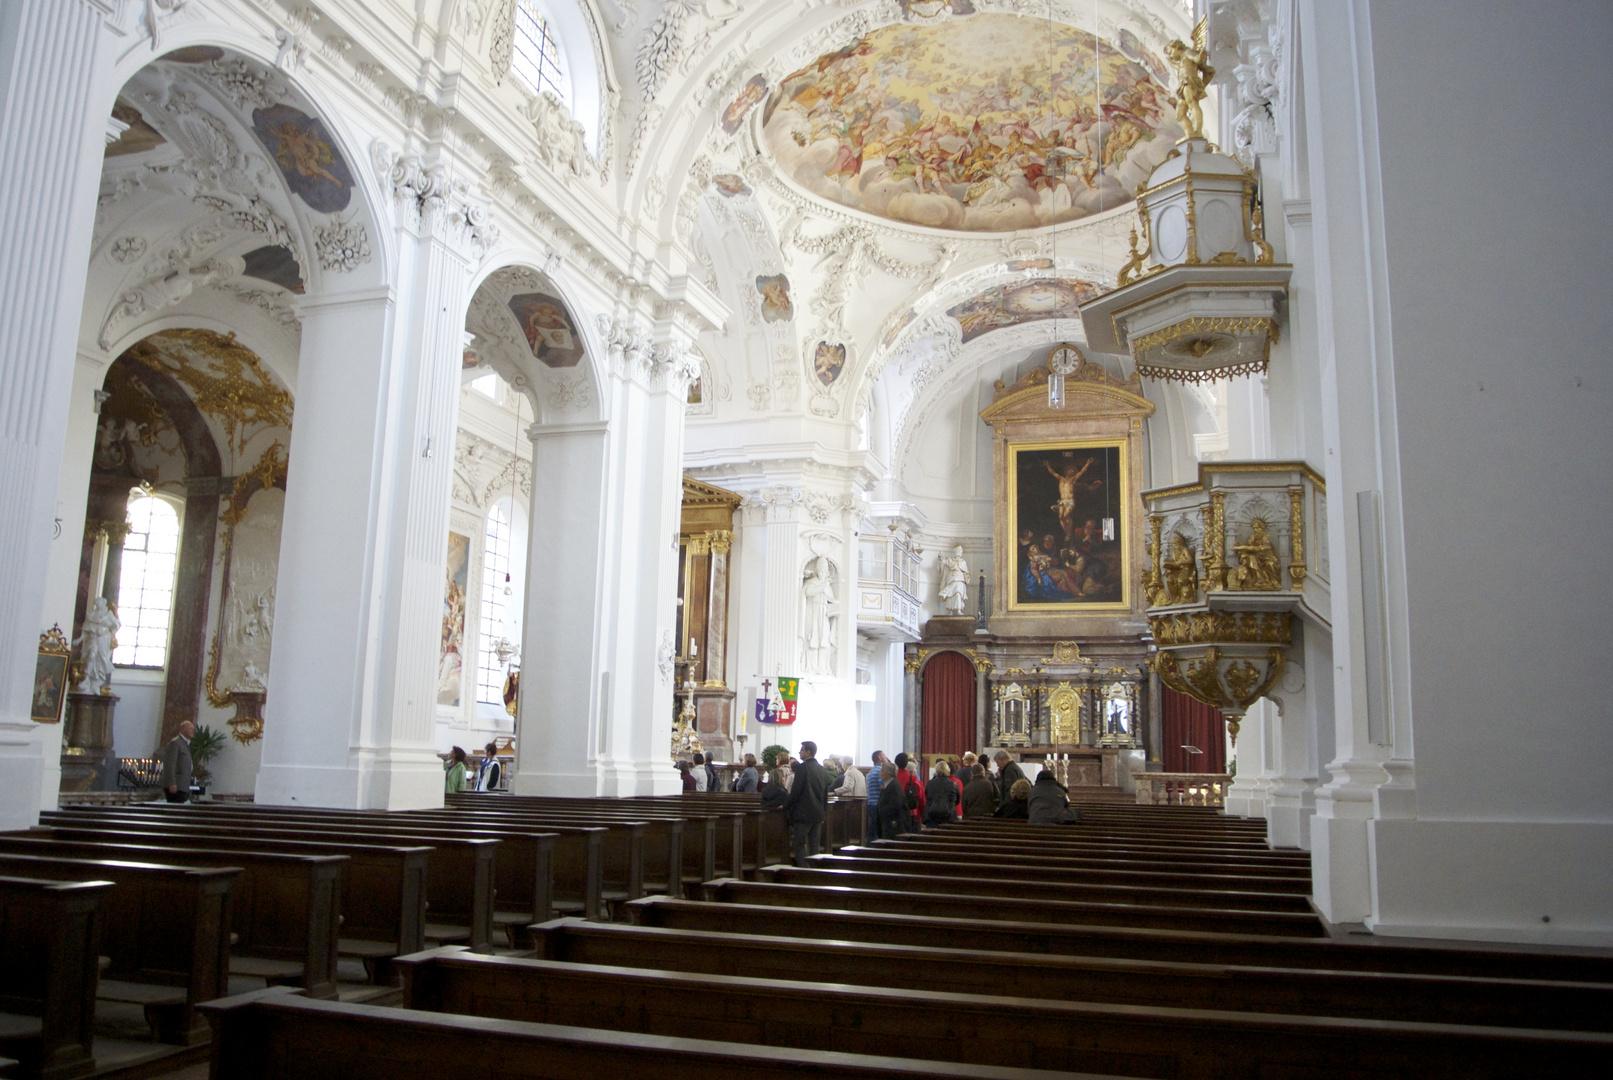 2. Pfarrkirche St. Quirinus Tegernsee